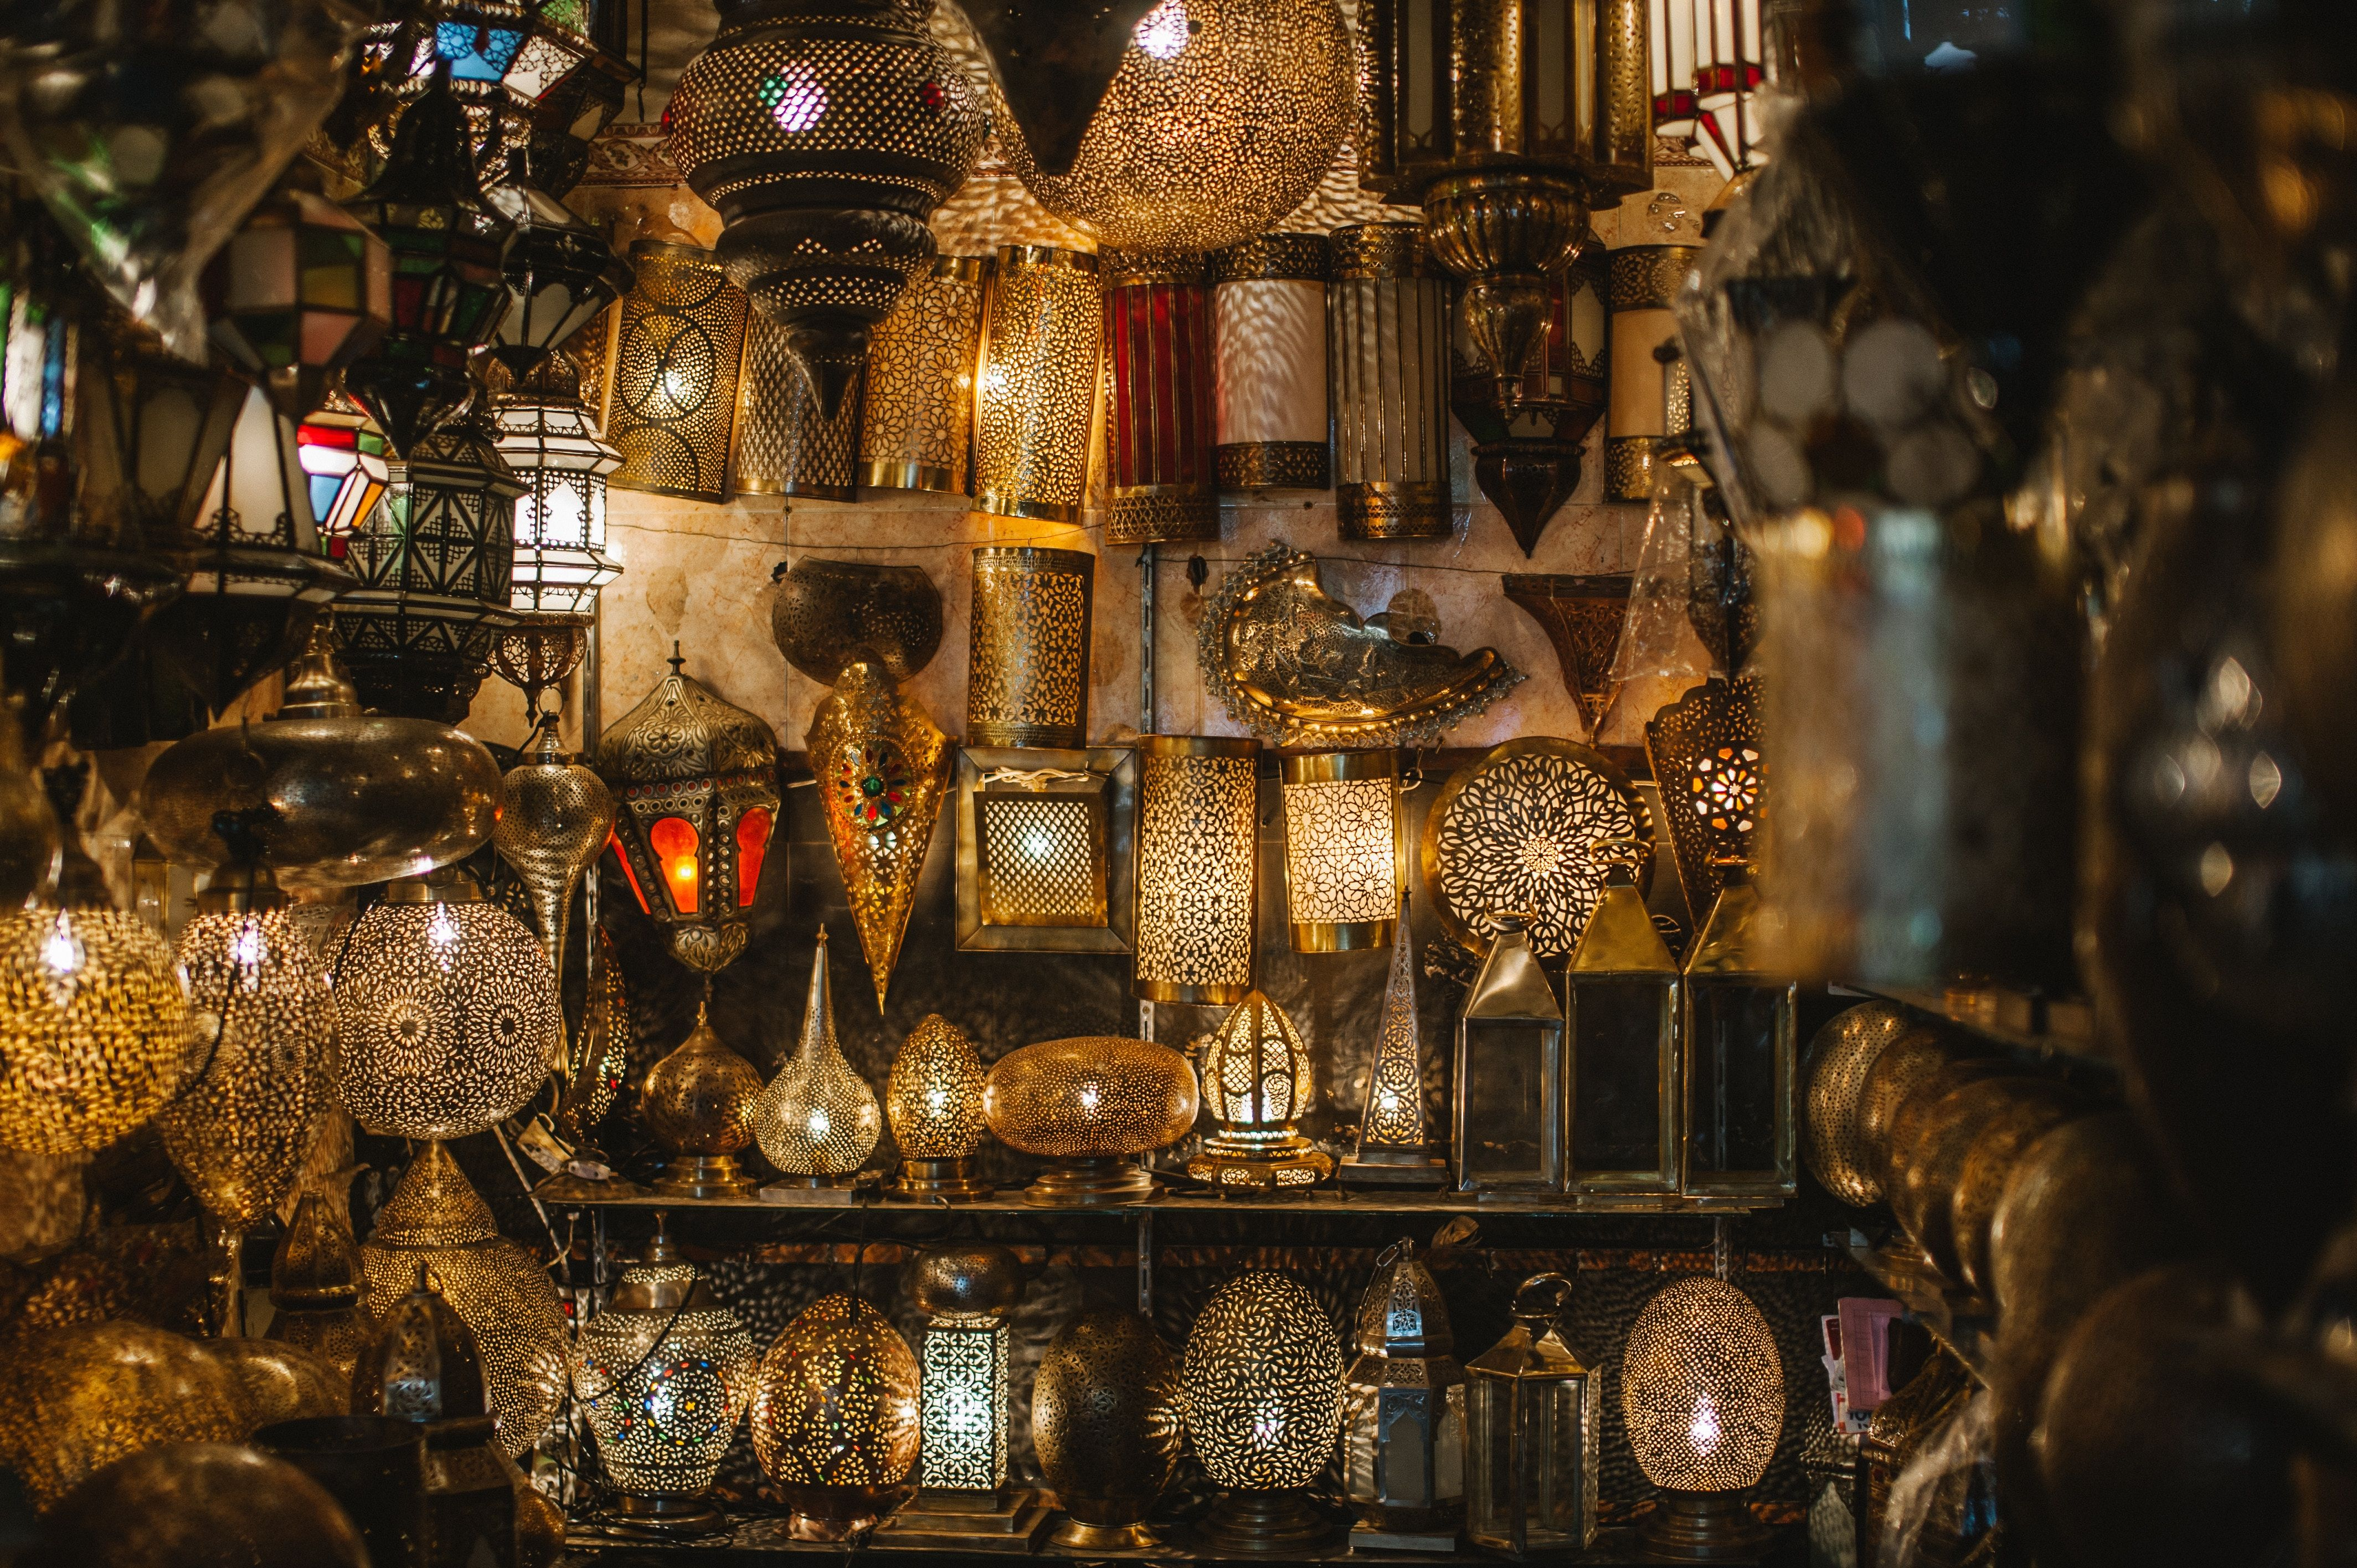 Lamps at Marrakech market